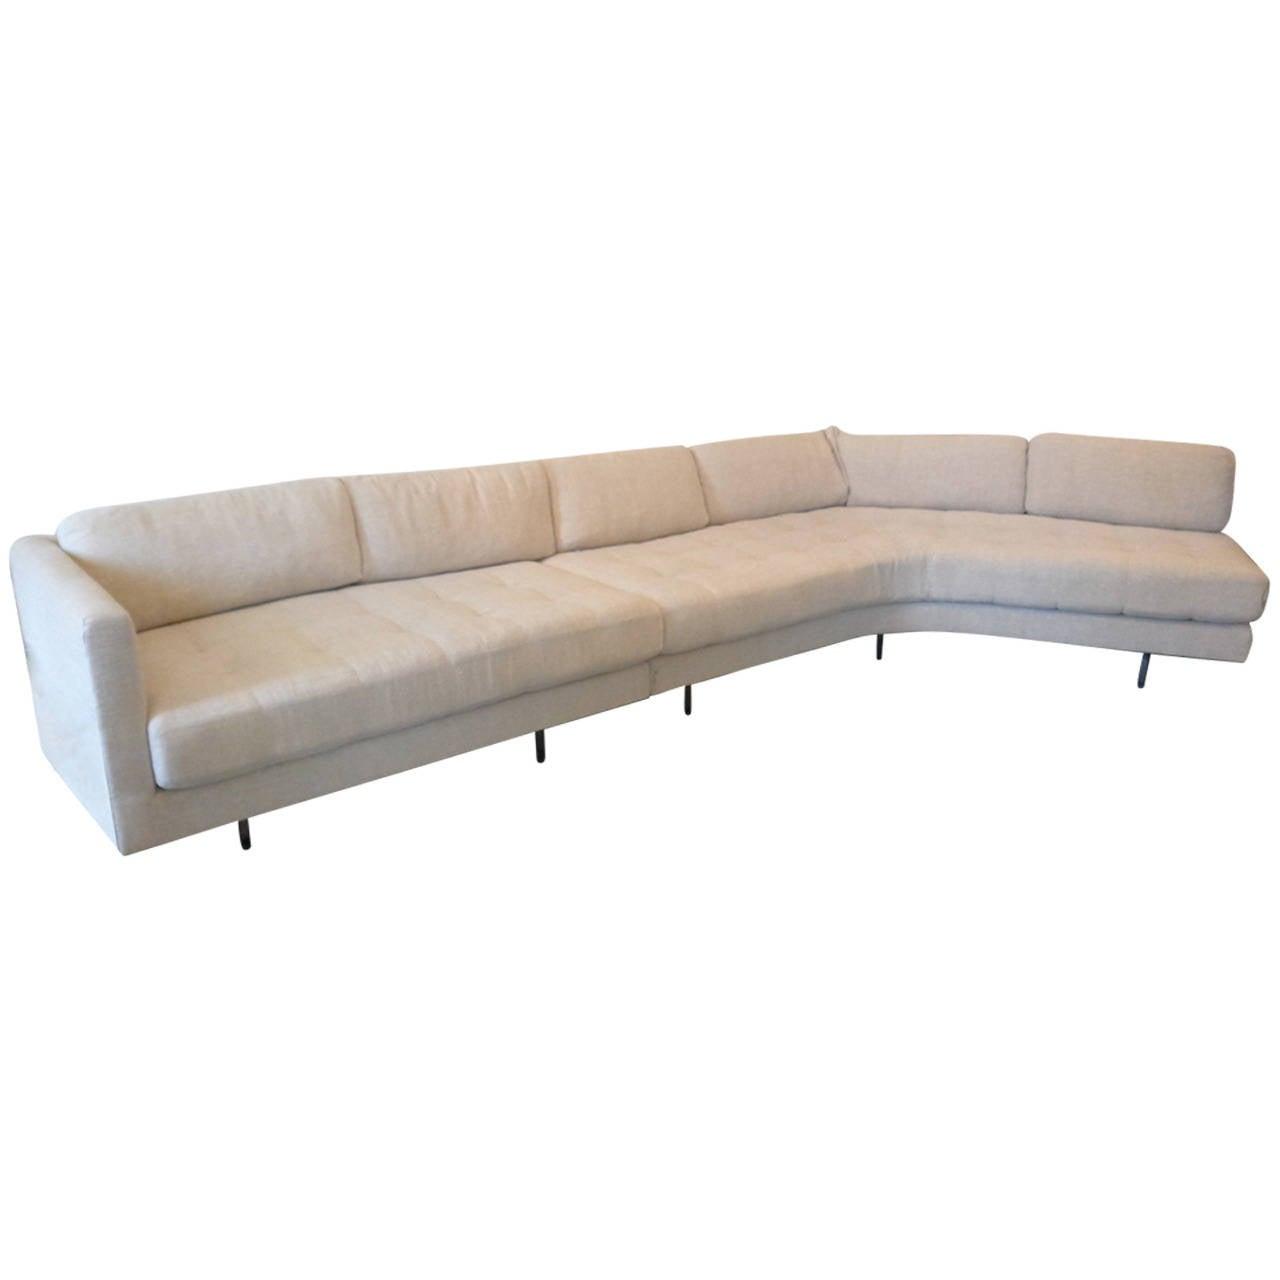 Vladimir Kagan Omnibus Sofa With Lucite Legs At 1stdibs